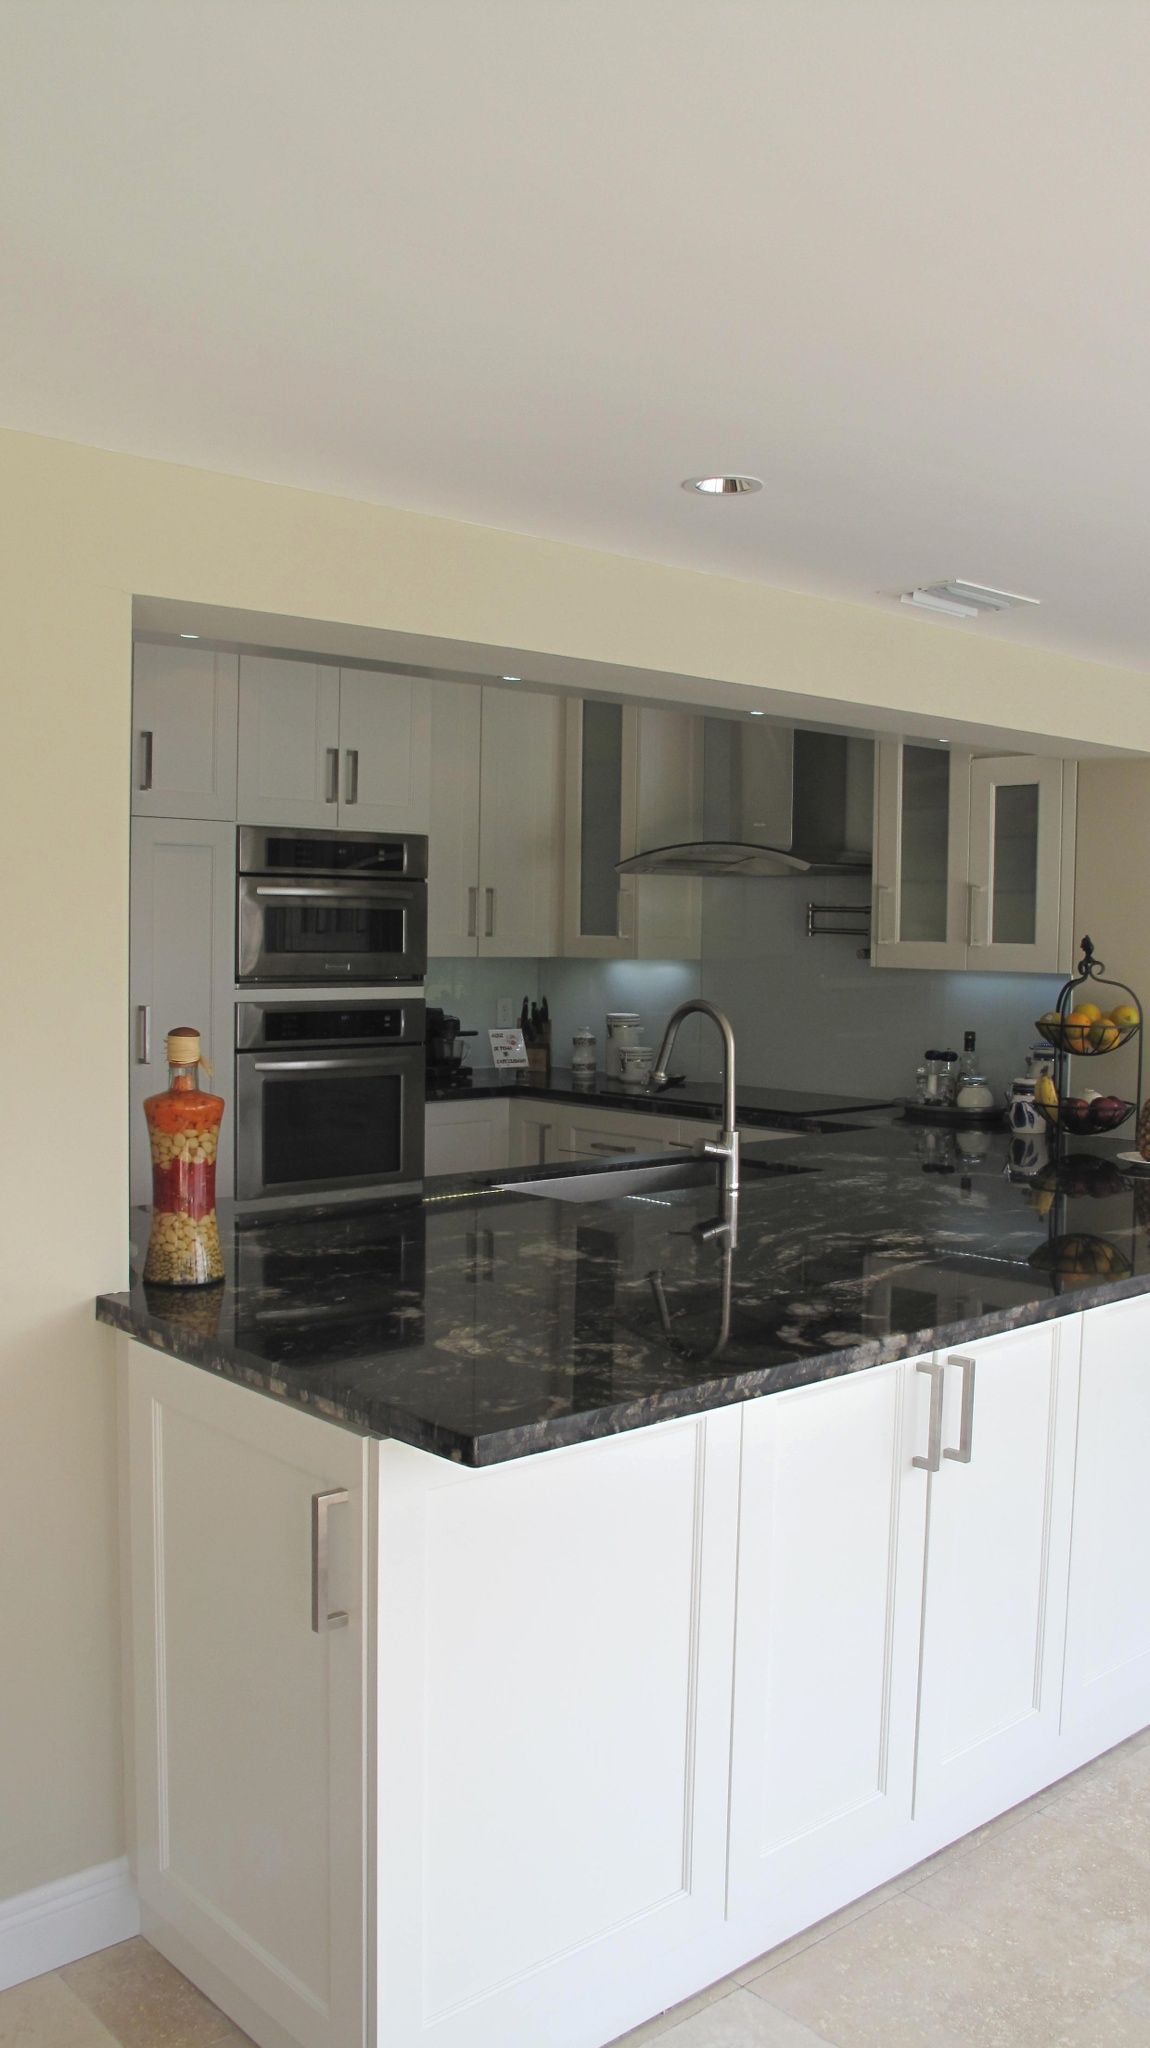 Kitchens-17.jpg